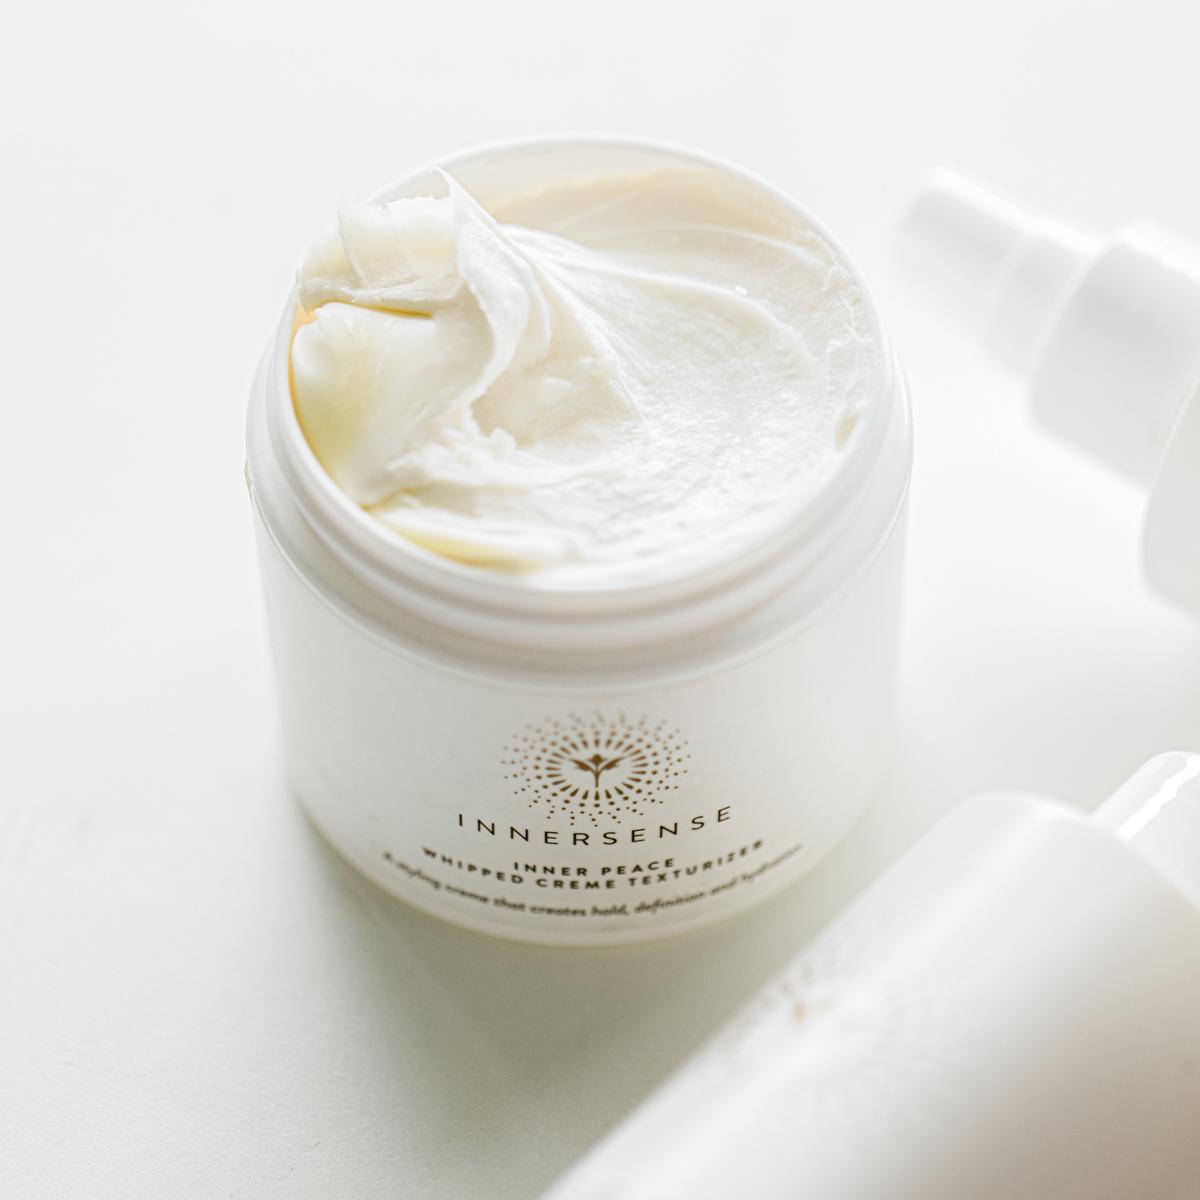 Innersense Organic Beauty Haarpflege-2